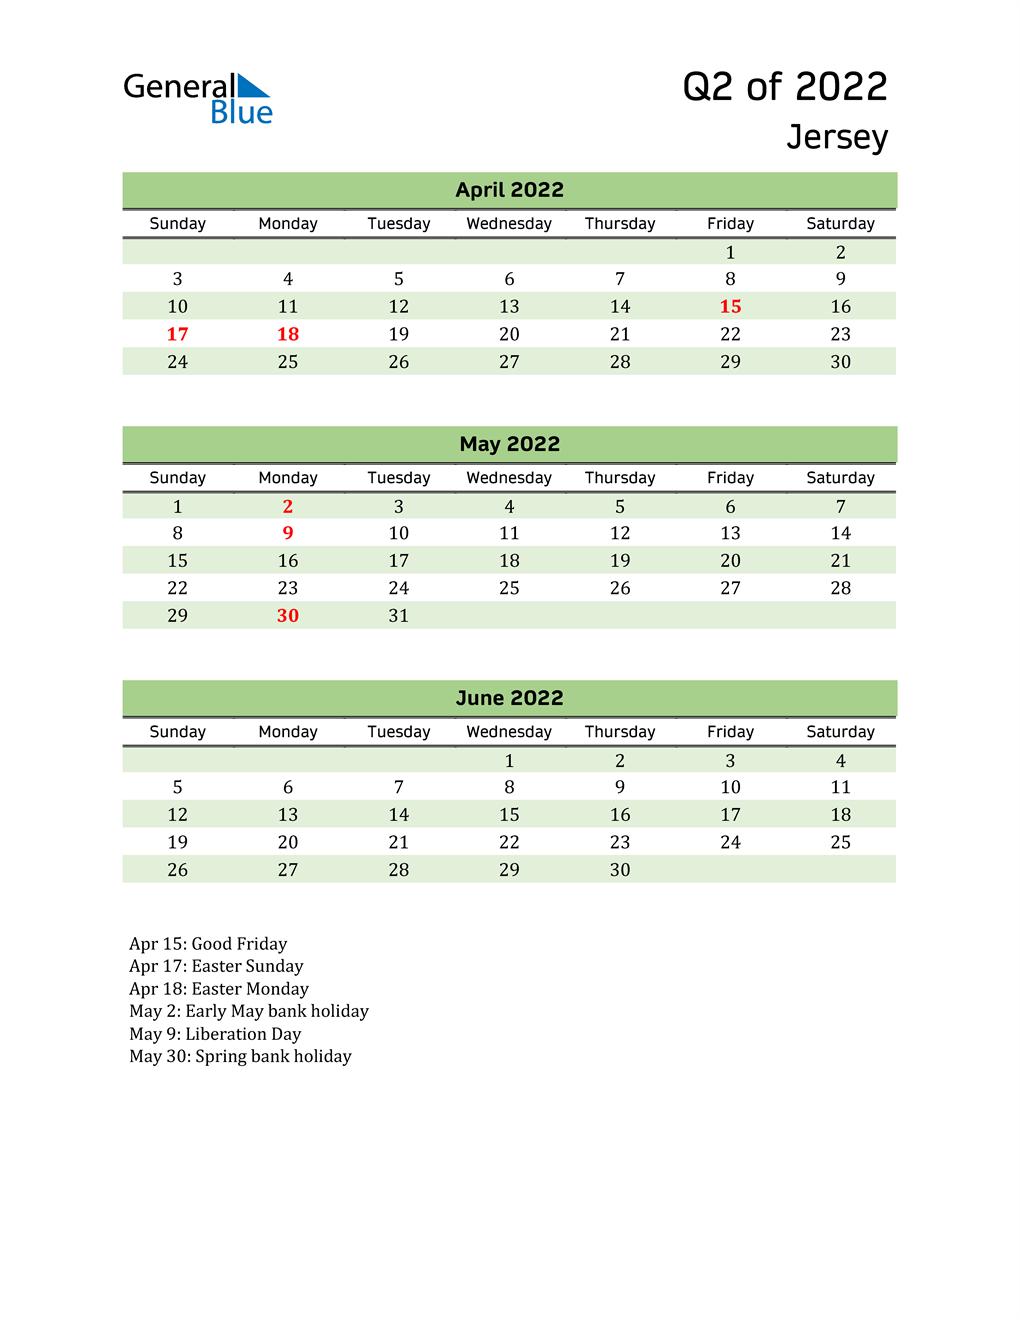 Quarterly Calendar 2022 with Jersey Holidays